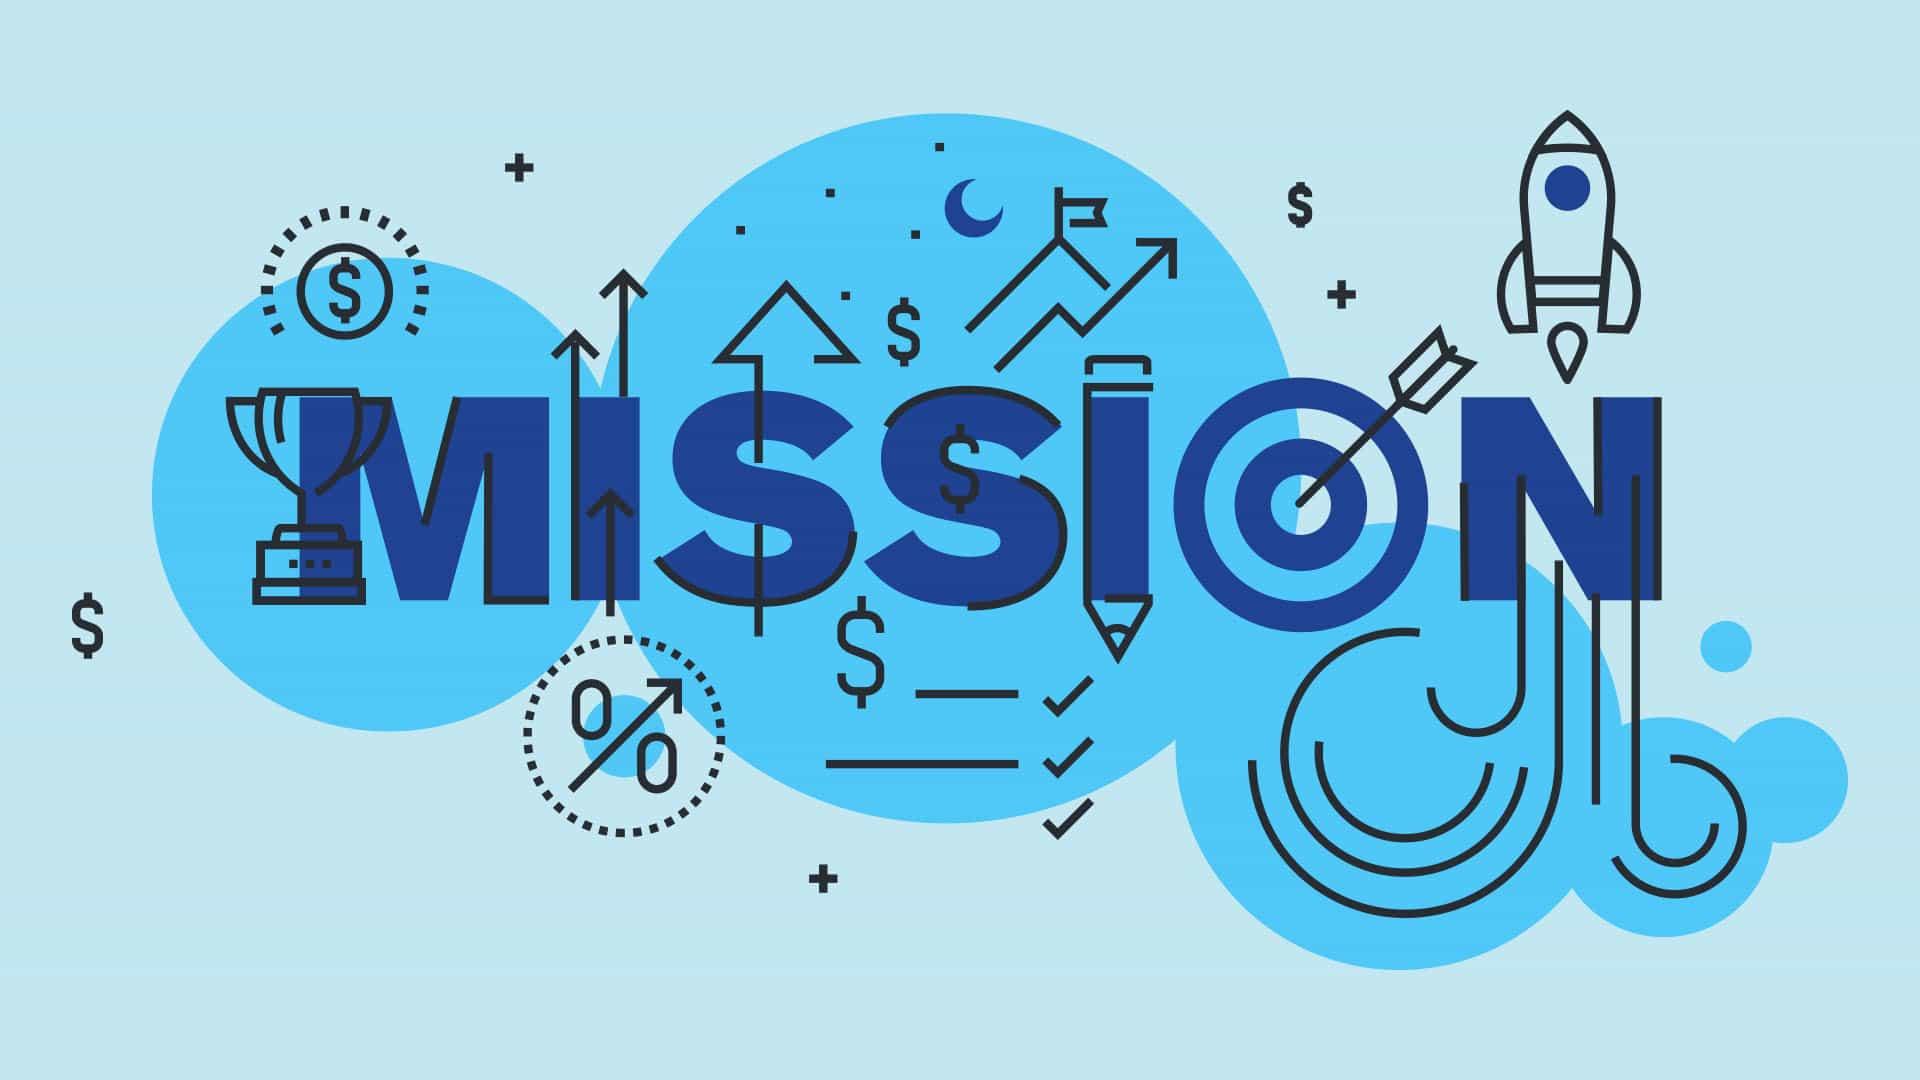 Menyelesaikan-berbagai-tugas-atau-misi-harian